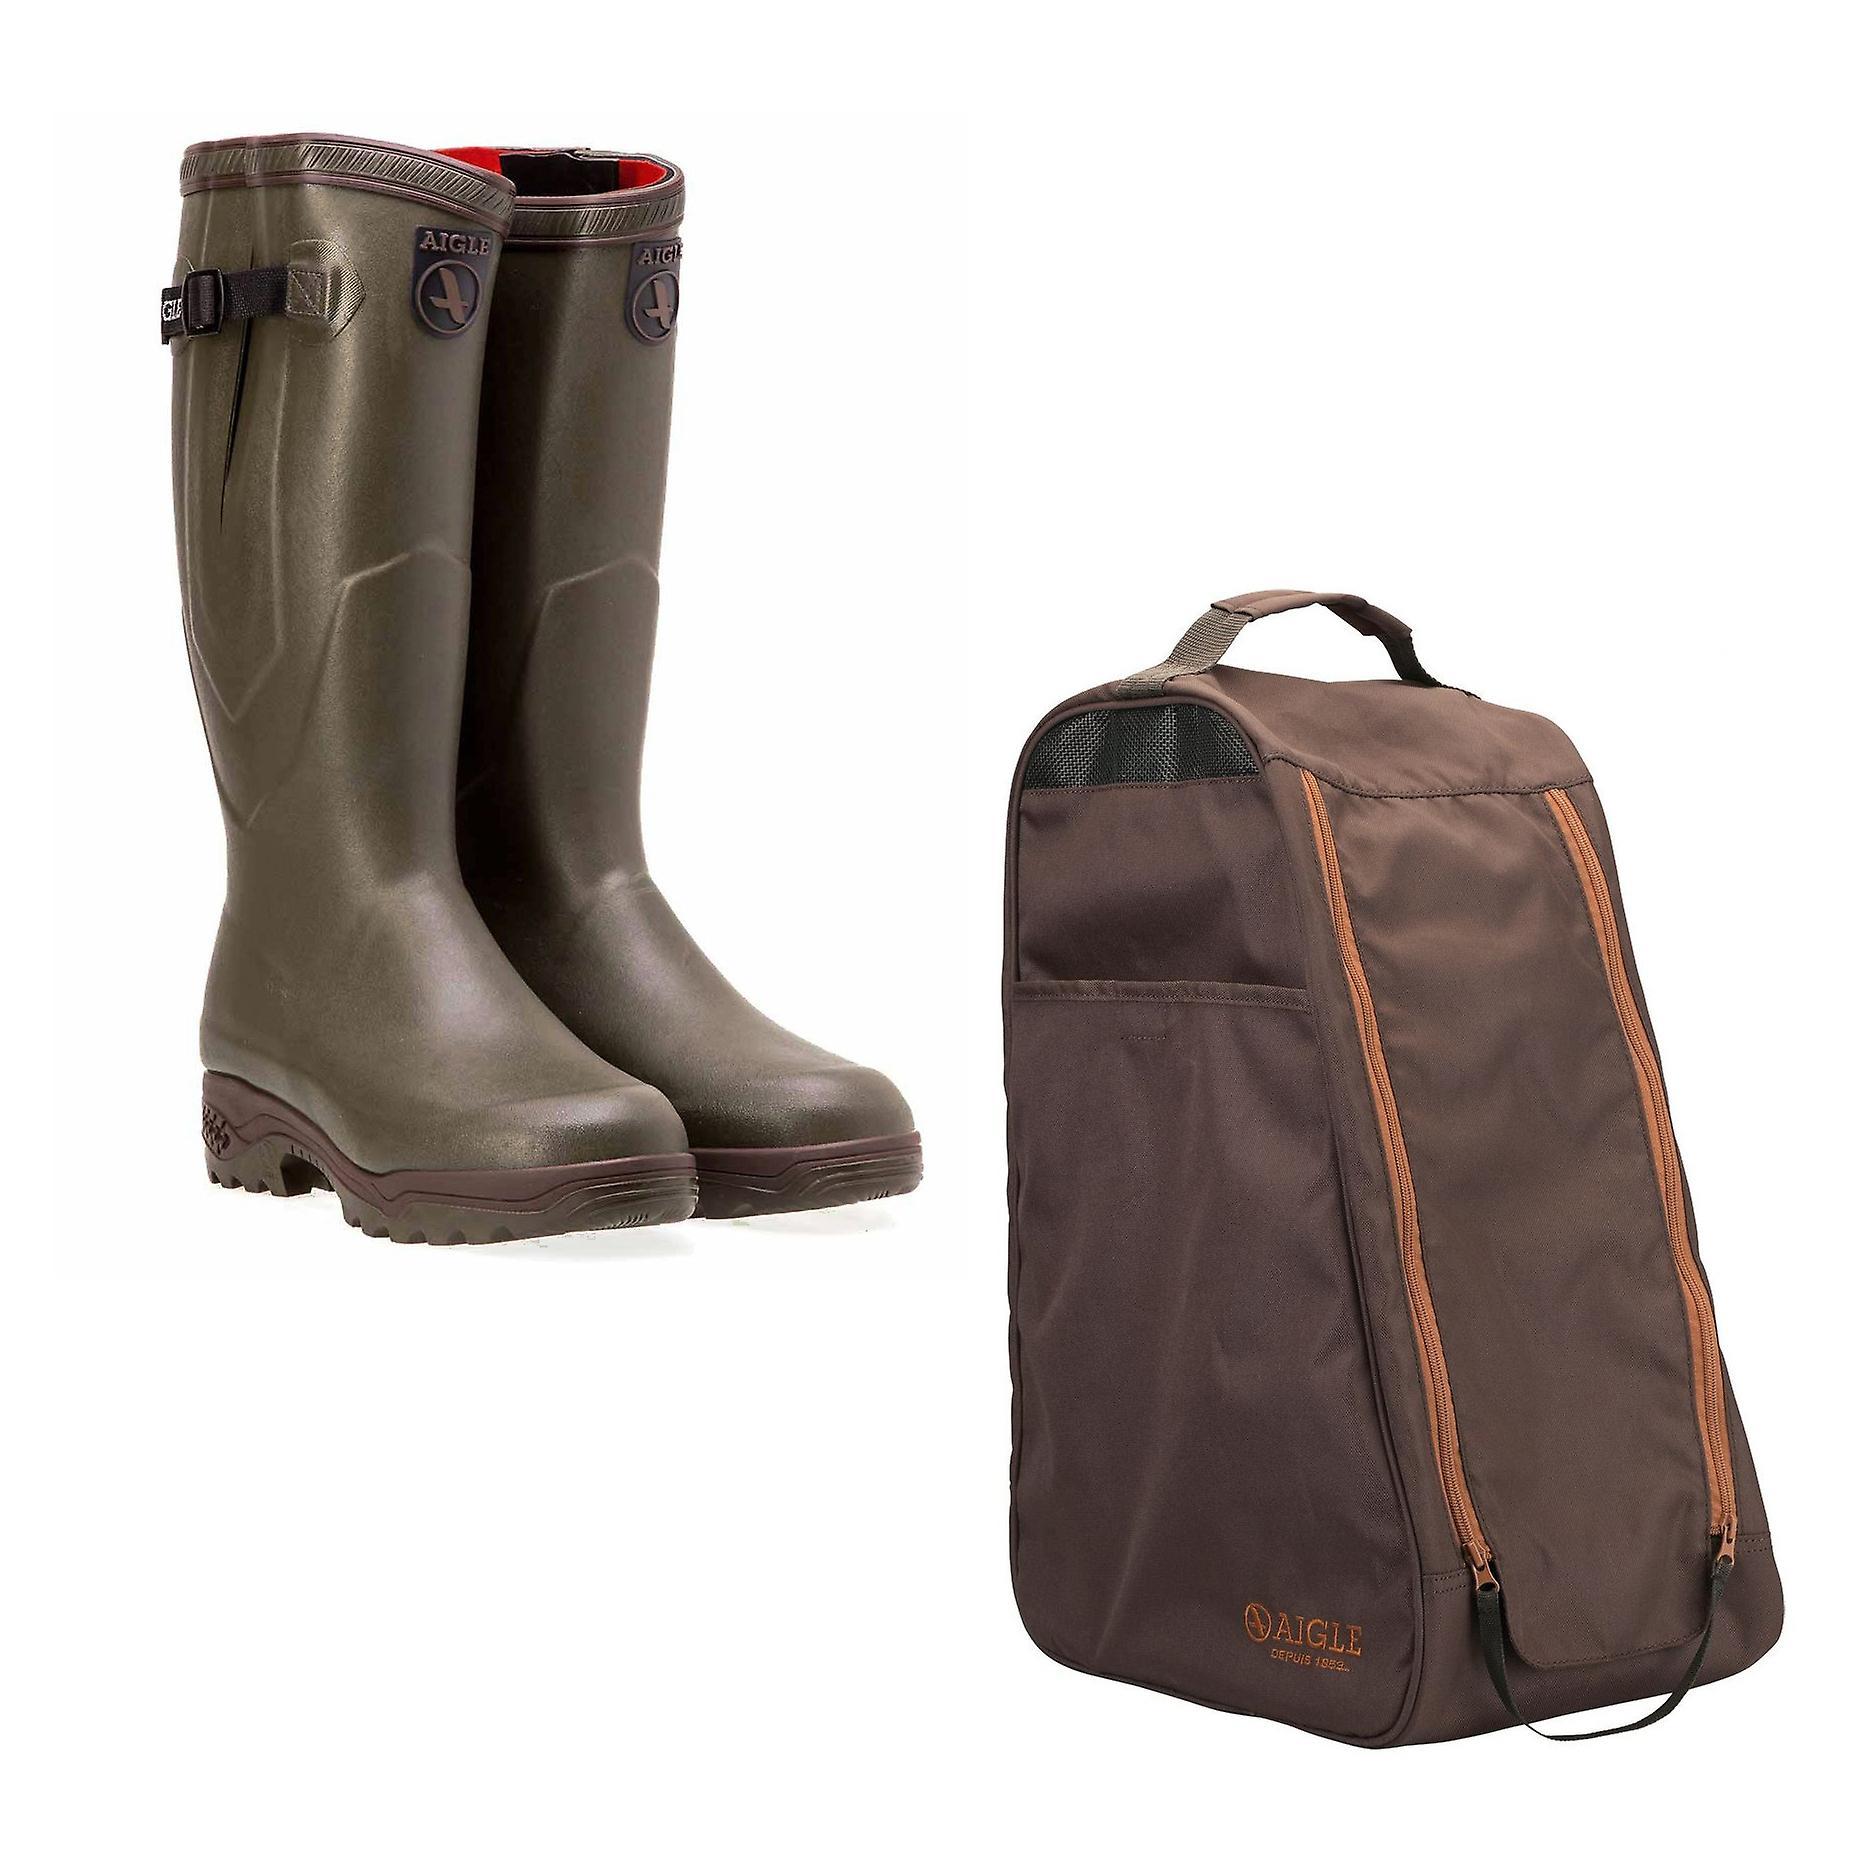 Aigle Parcours 2 ISO معزول ولينغتون الأحذية مع حقيبة التمهيد Aigle